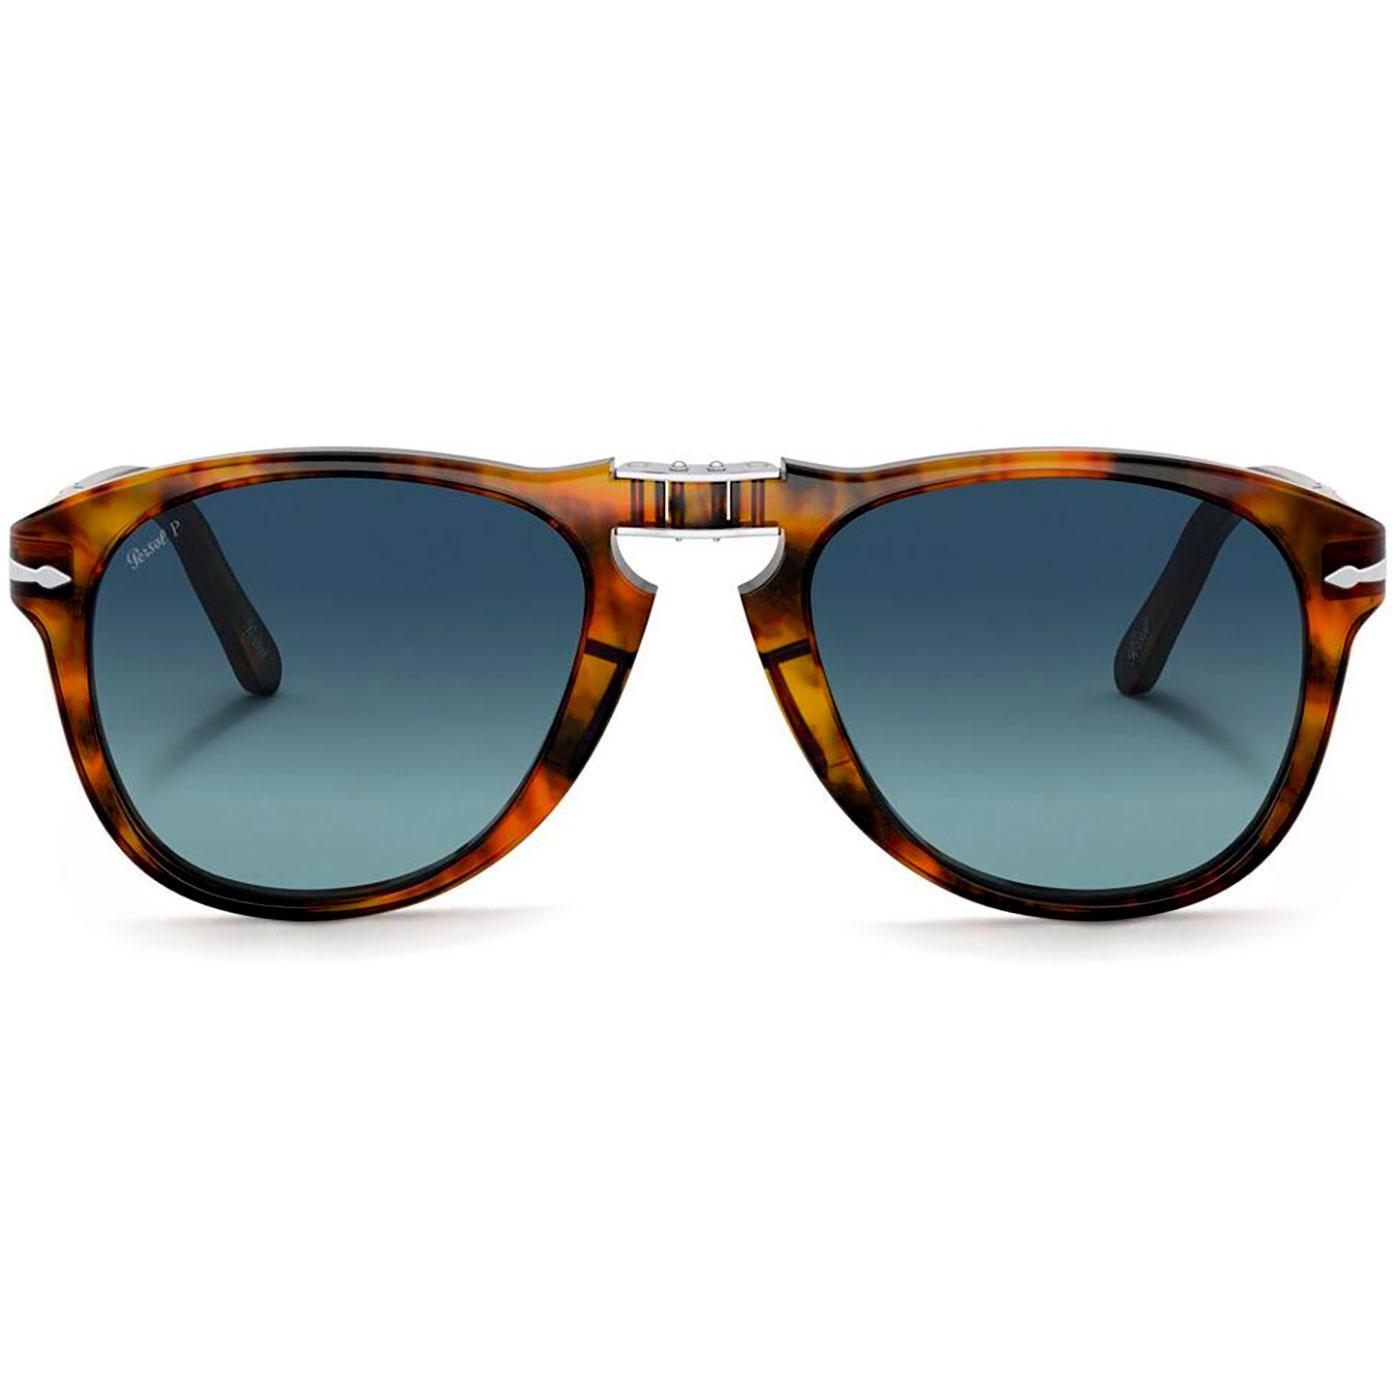 PERSOL Steve McQueen 714SM Sunglasses (Caffe)